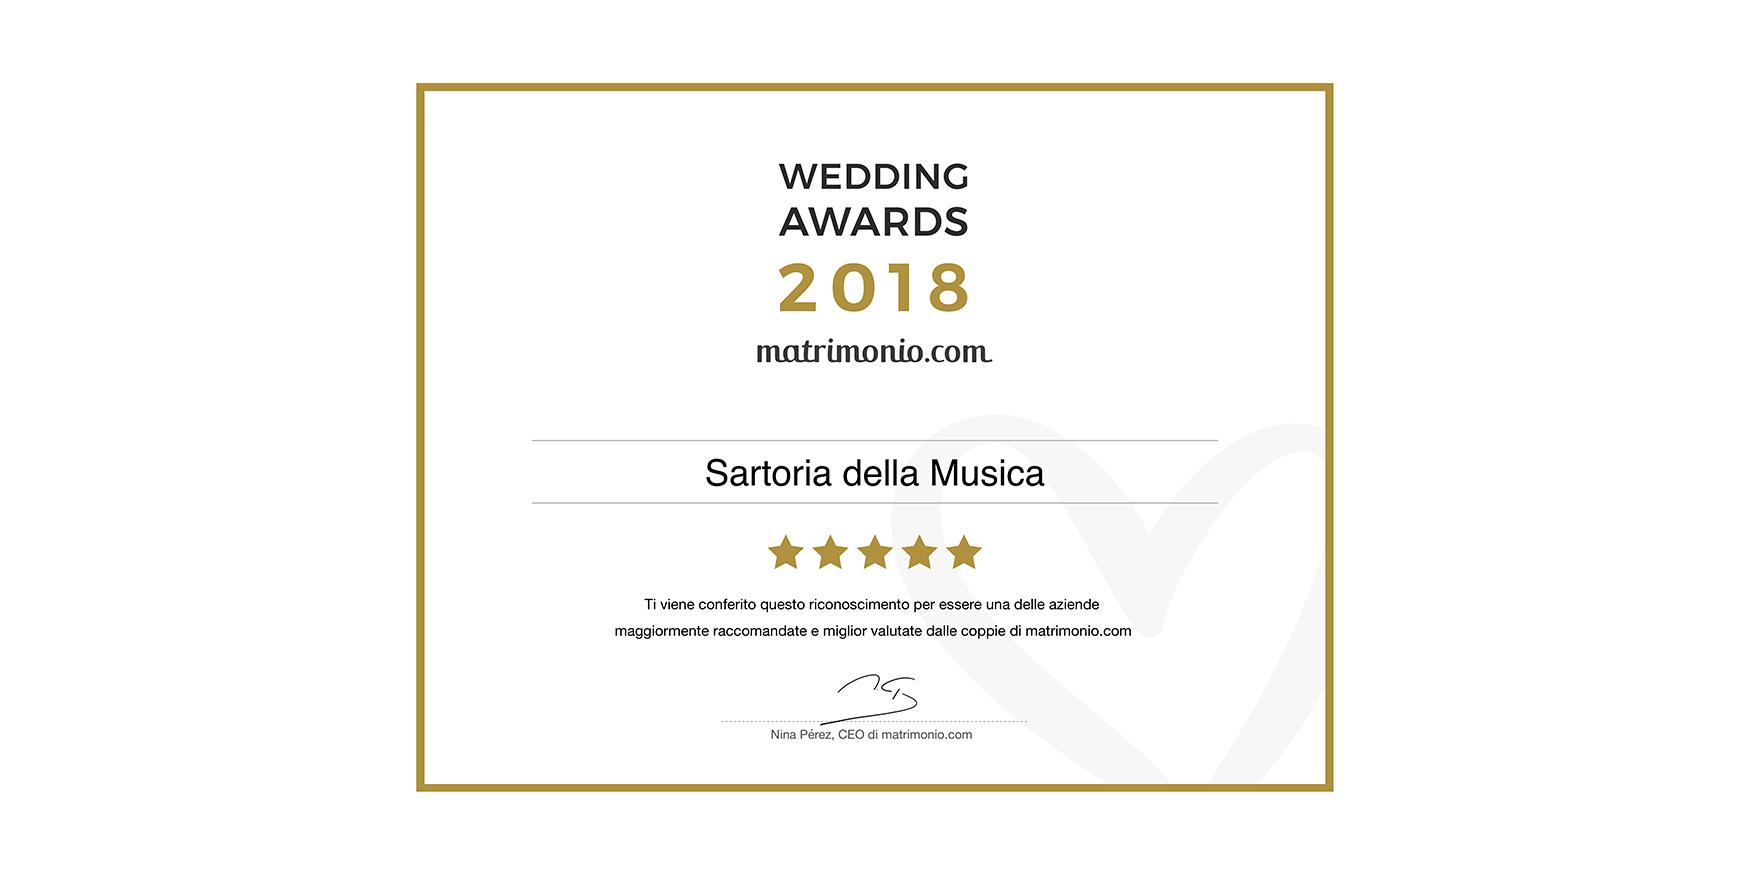 WEDDING AWARDS 2018